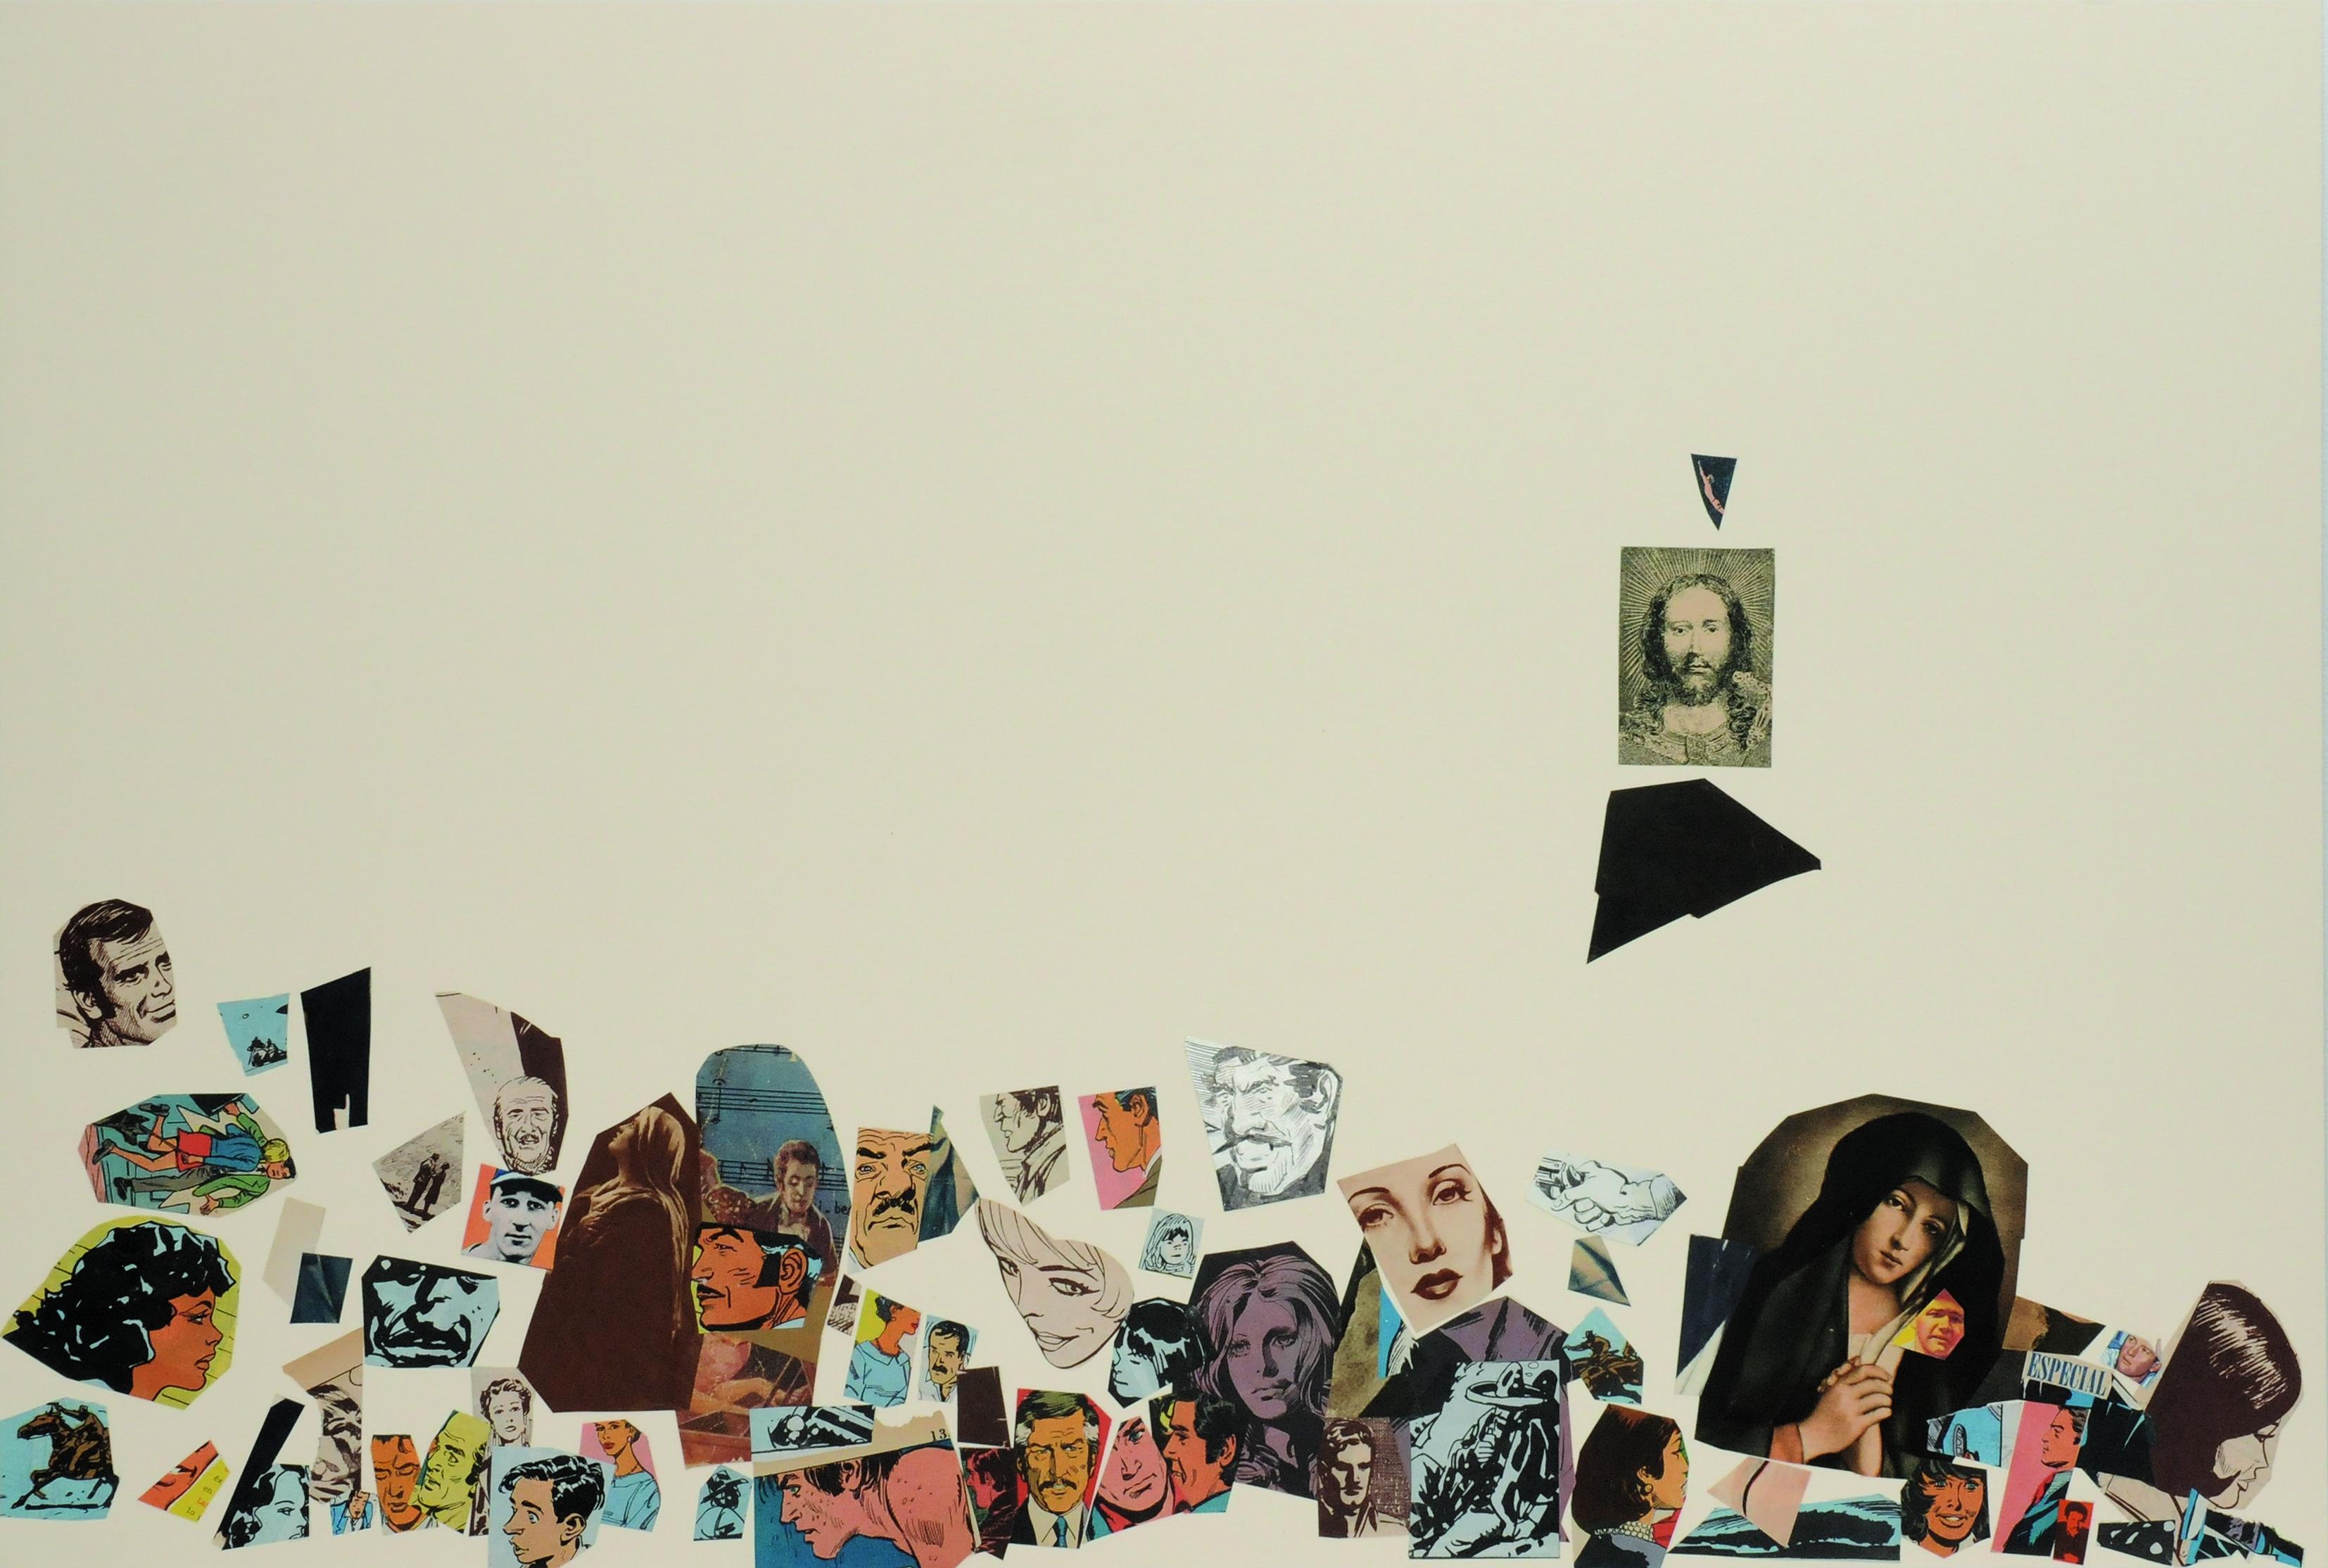 Especial, papel collage, 51 cm x 76 cm. 2008